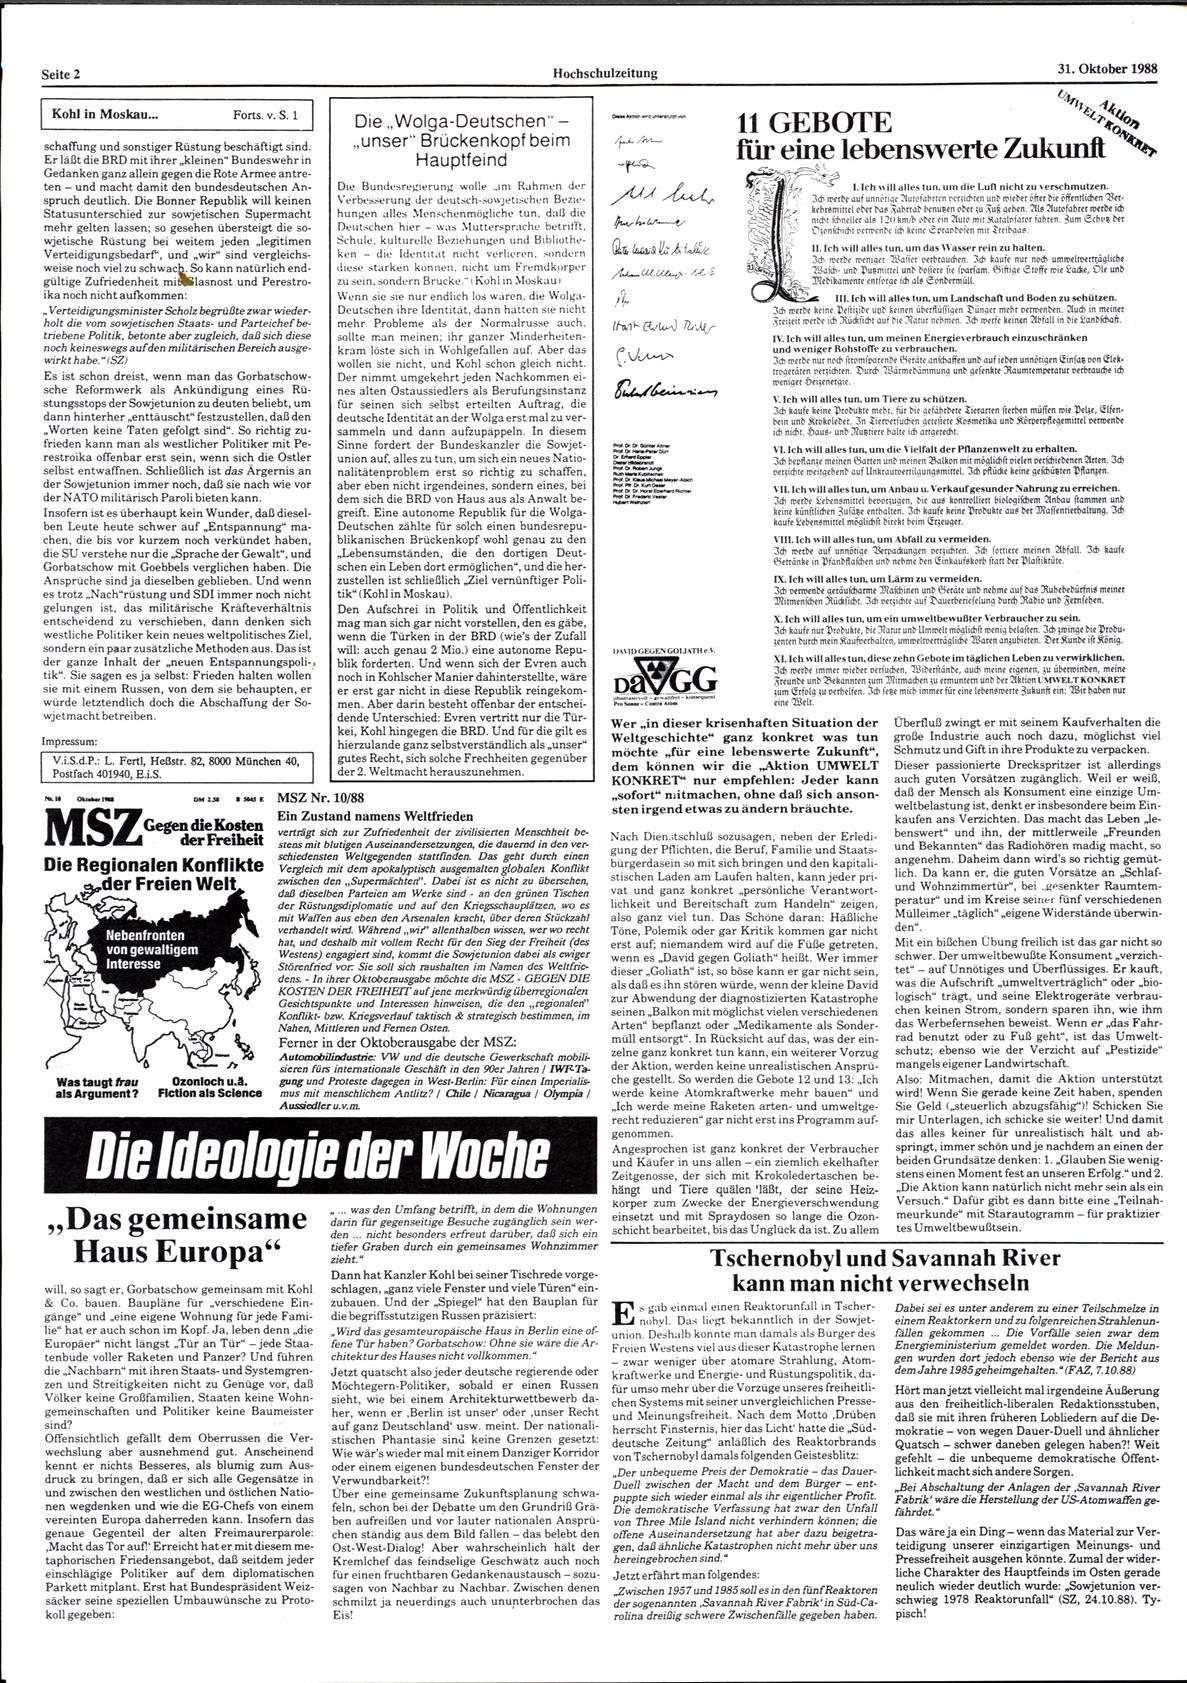 Bochum_BHZ_19881031_180_002